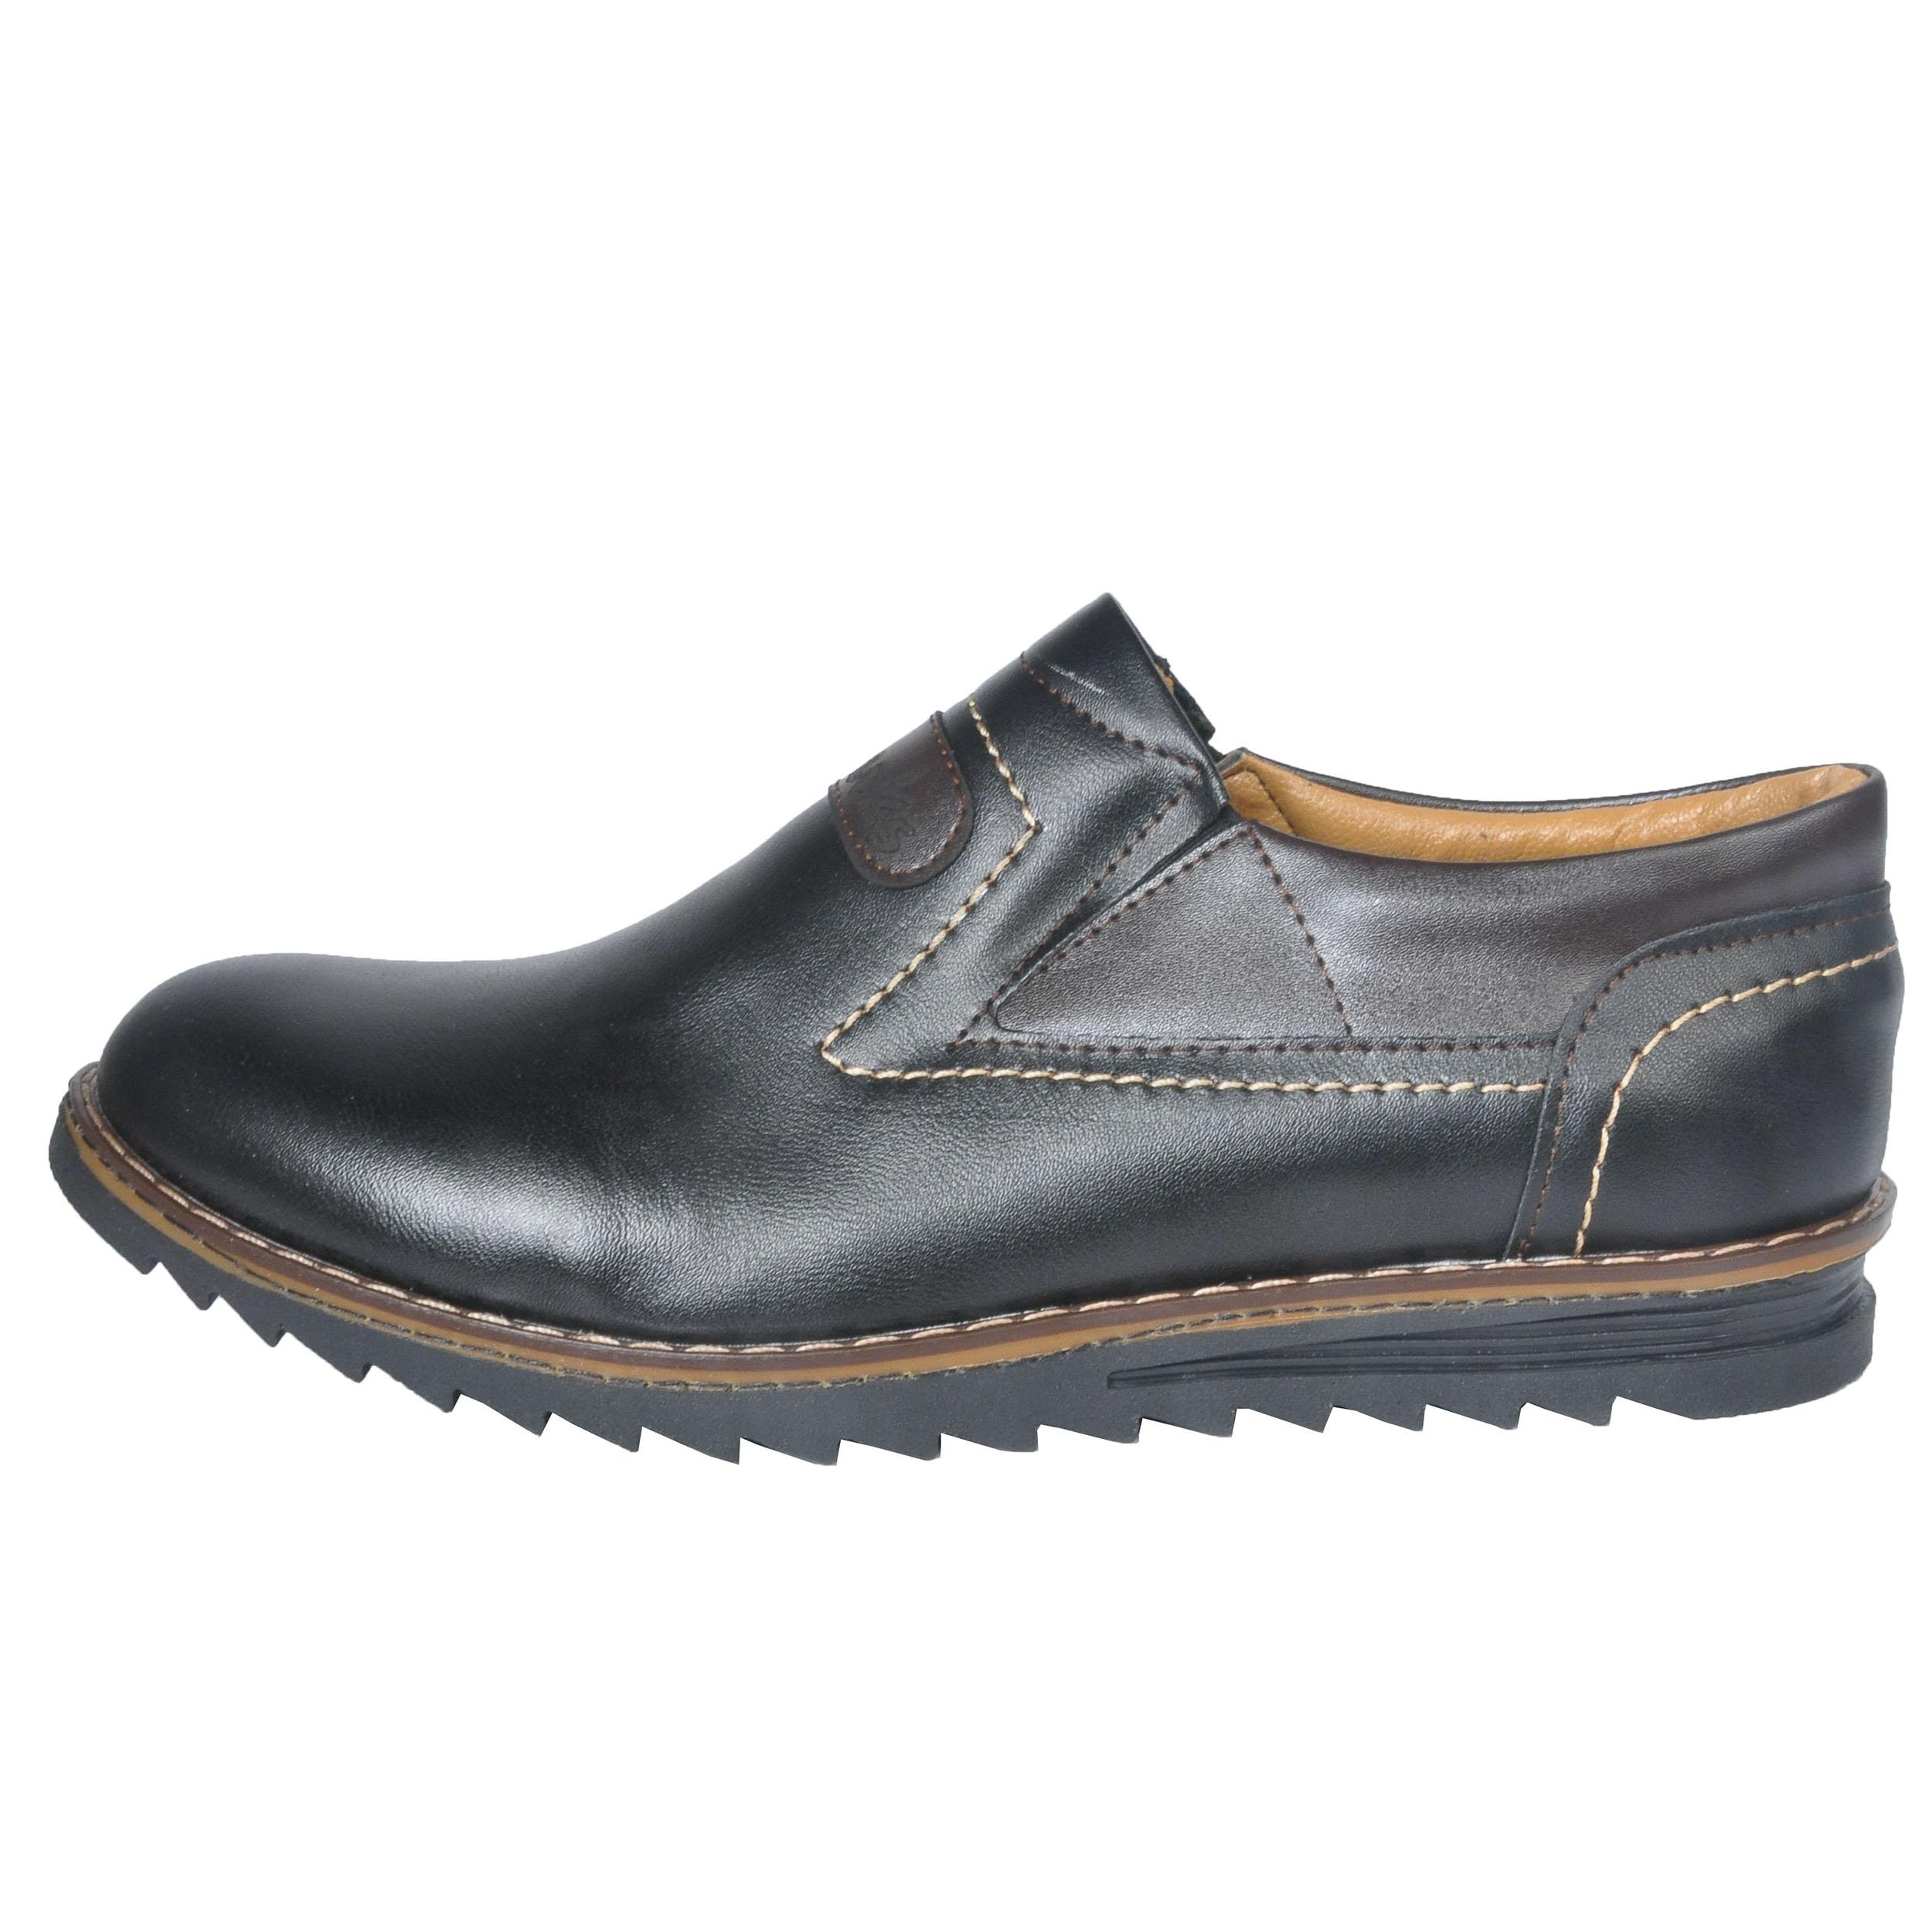 کفش روزمره مردانه مدل m293m